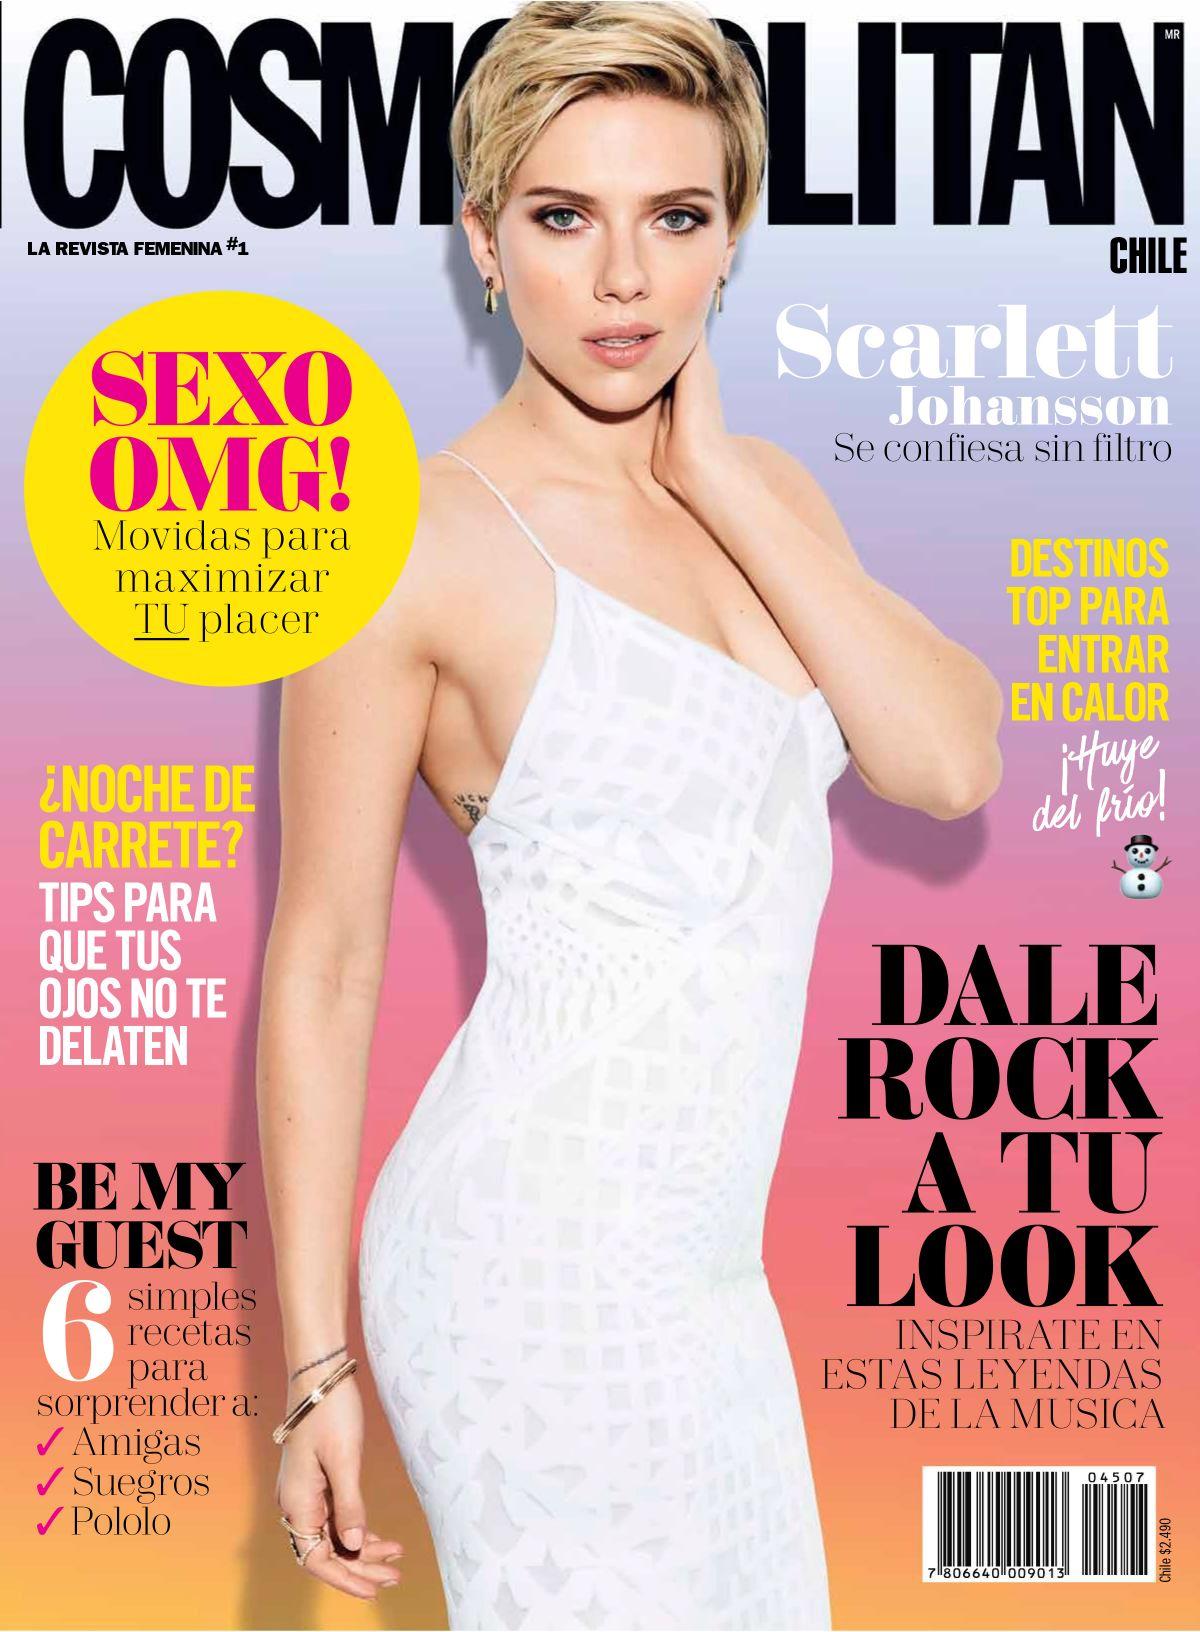 SCARLETT JOHANSSON in Cosmopolitan Magazine, Chile July 2017